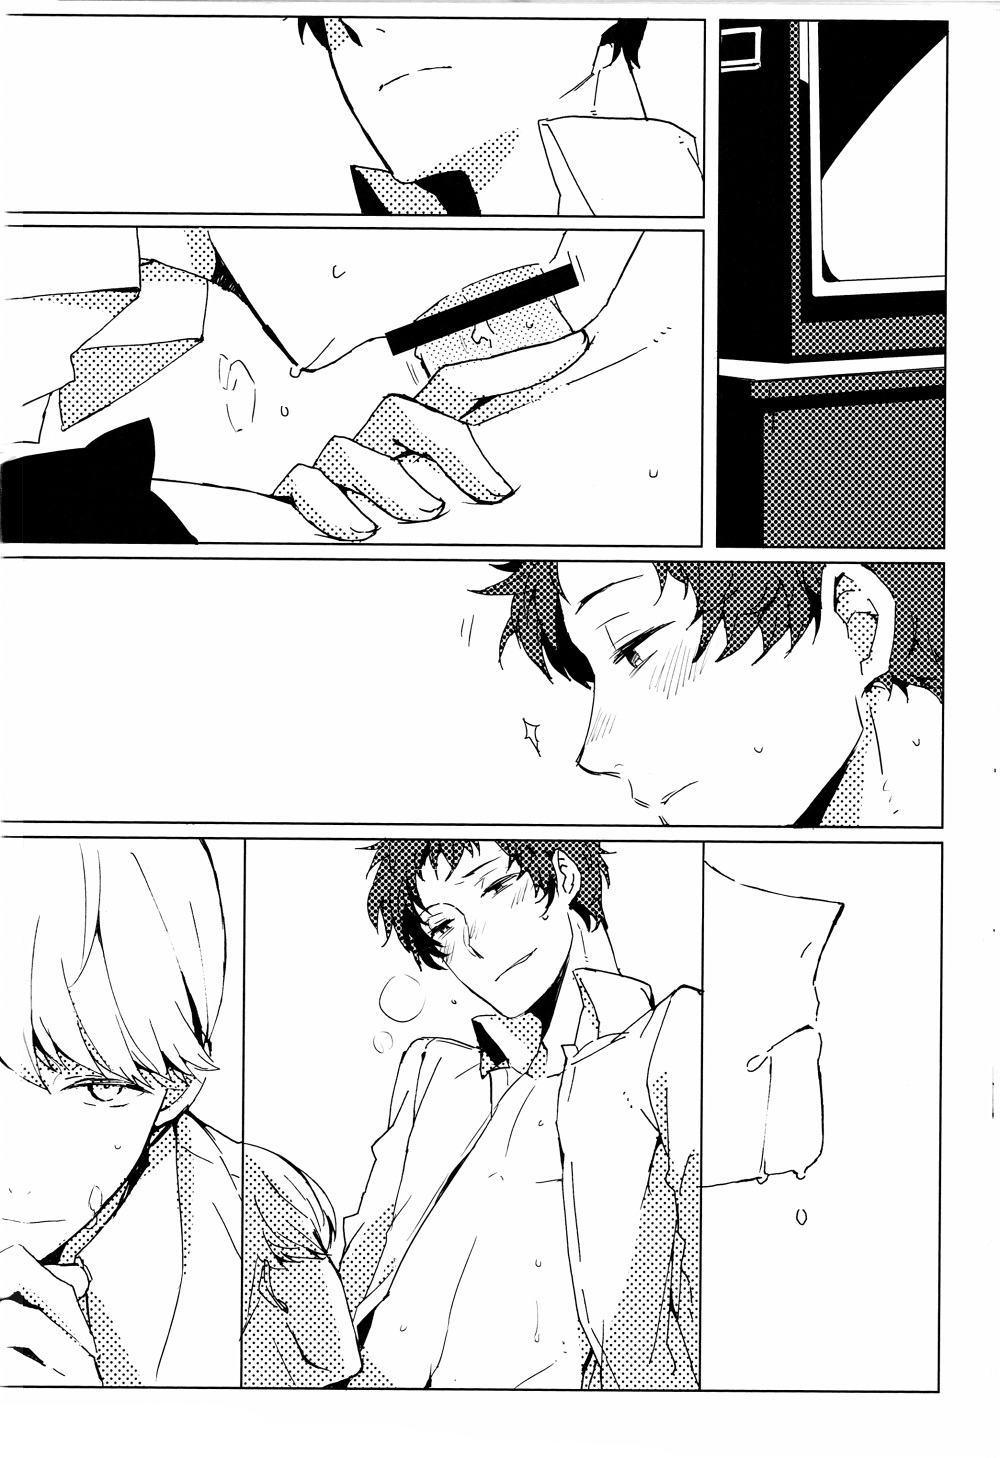 Trang 4 - Chia Sẻ Sự Tĩnh Lặng (- HEART STATION (Ebisushi)) - Truyện tranh Gay - Server HostedOnGoogleServerStaging